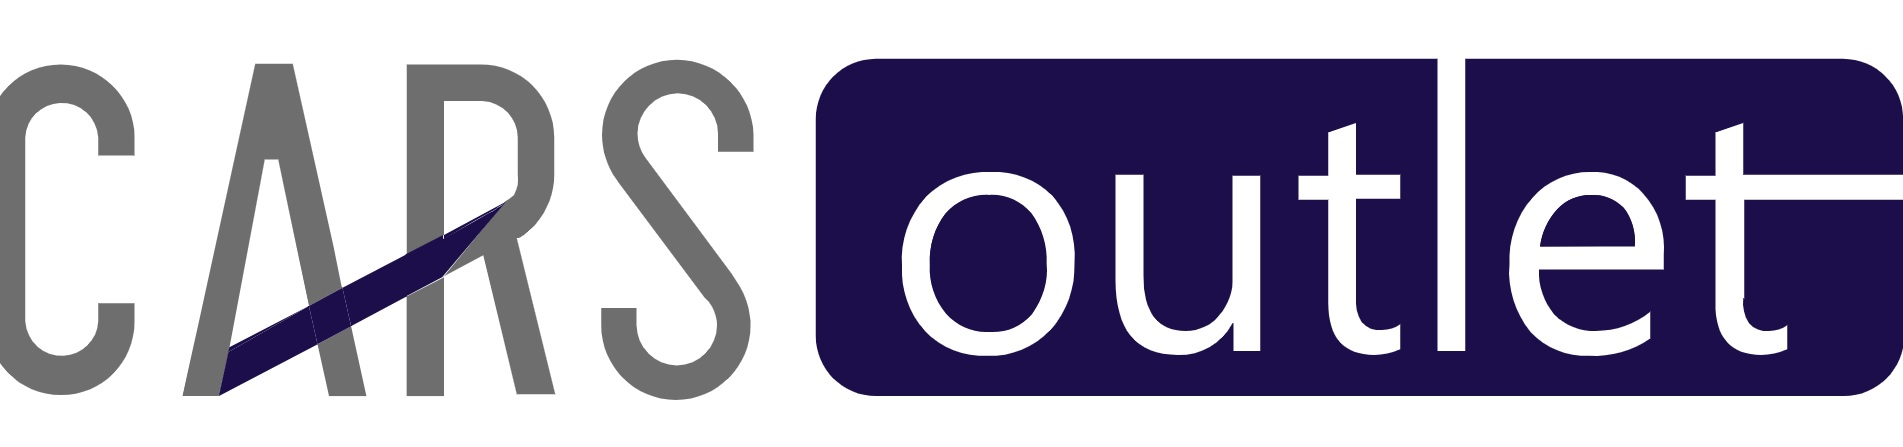 carsoutlet.lv logo